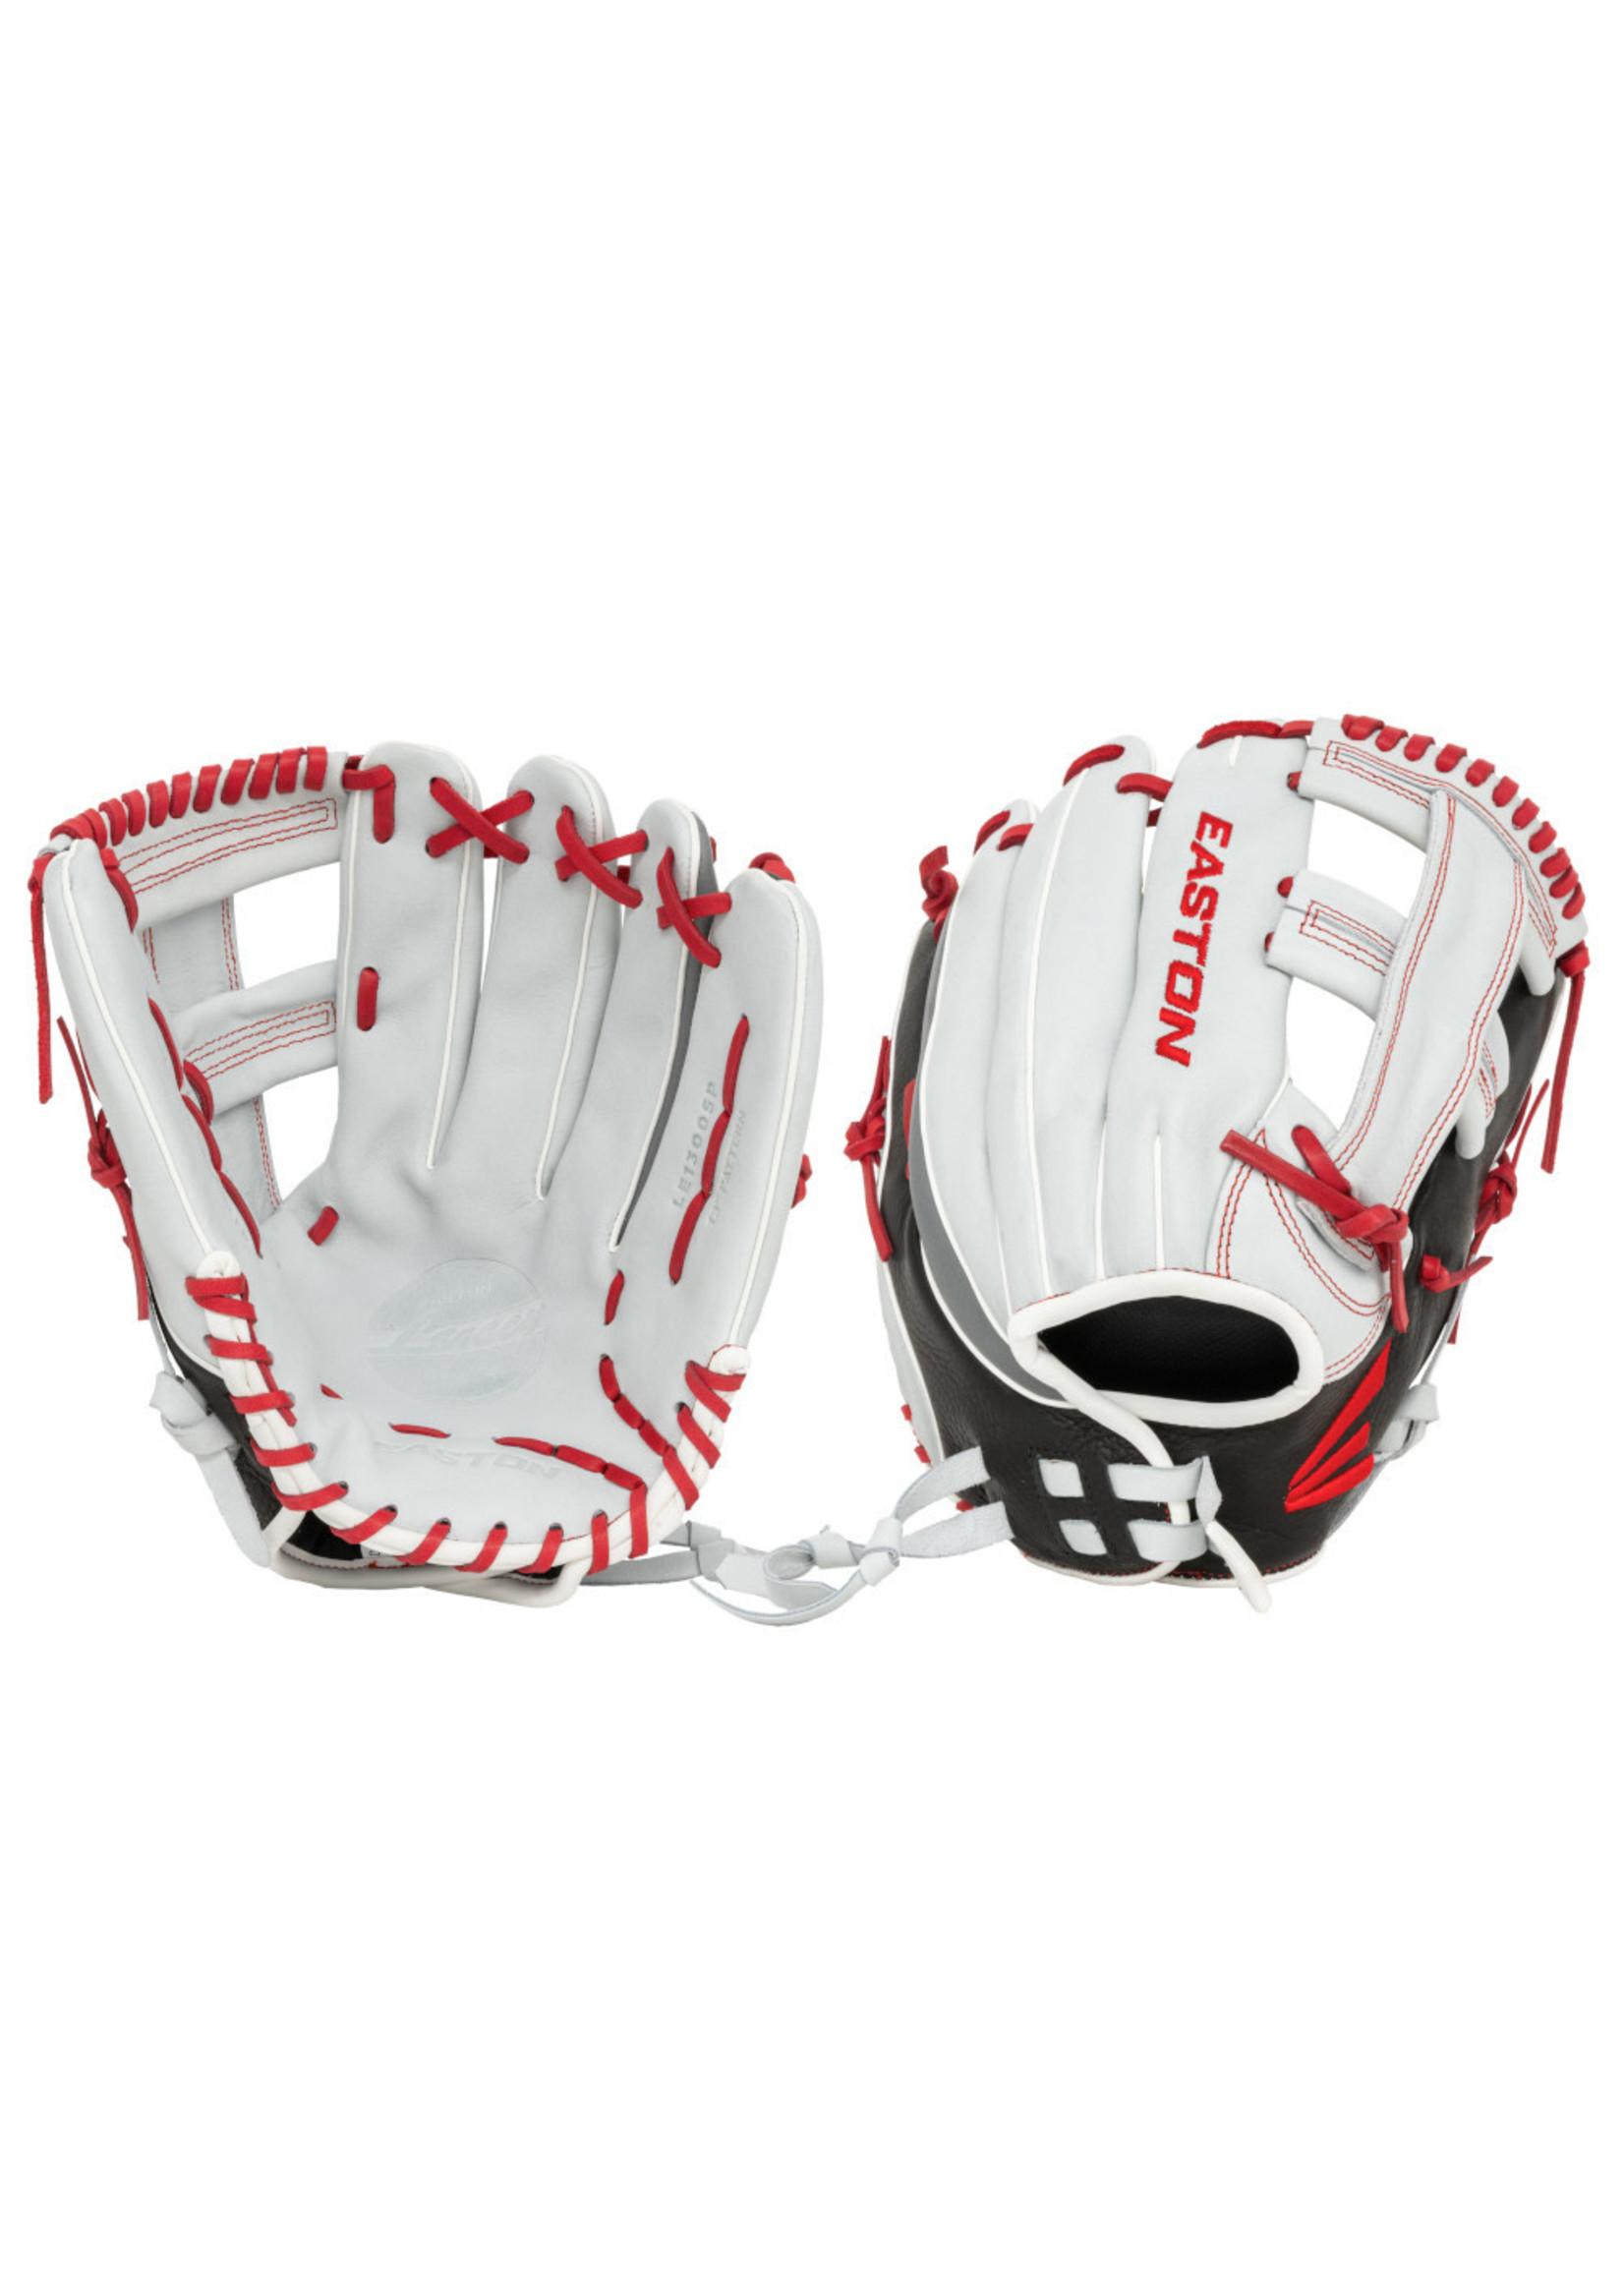 Easton Baseball (Canada) EASTON LEGACY ELITE LE1300SP 13 IN SPST LHT